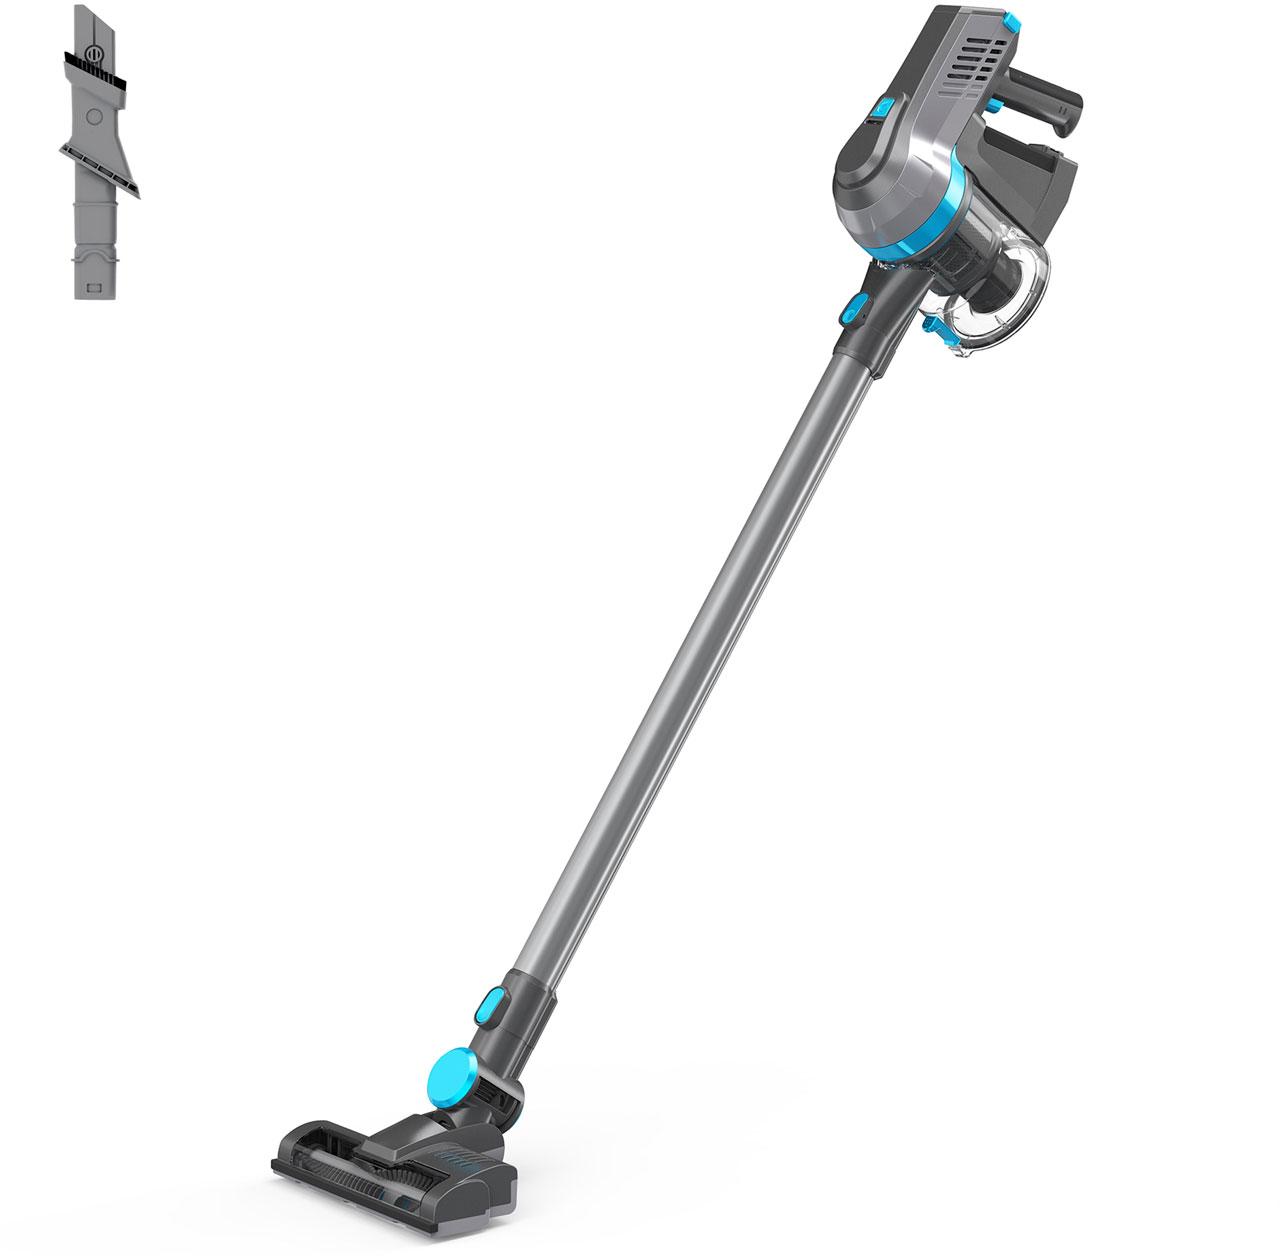 vax tbttv1b1 slimvac cordless vacuum cleaner 2 year. Black Bedroom Furniture Sets. Home Design Ideas